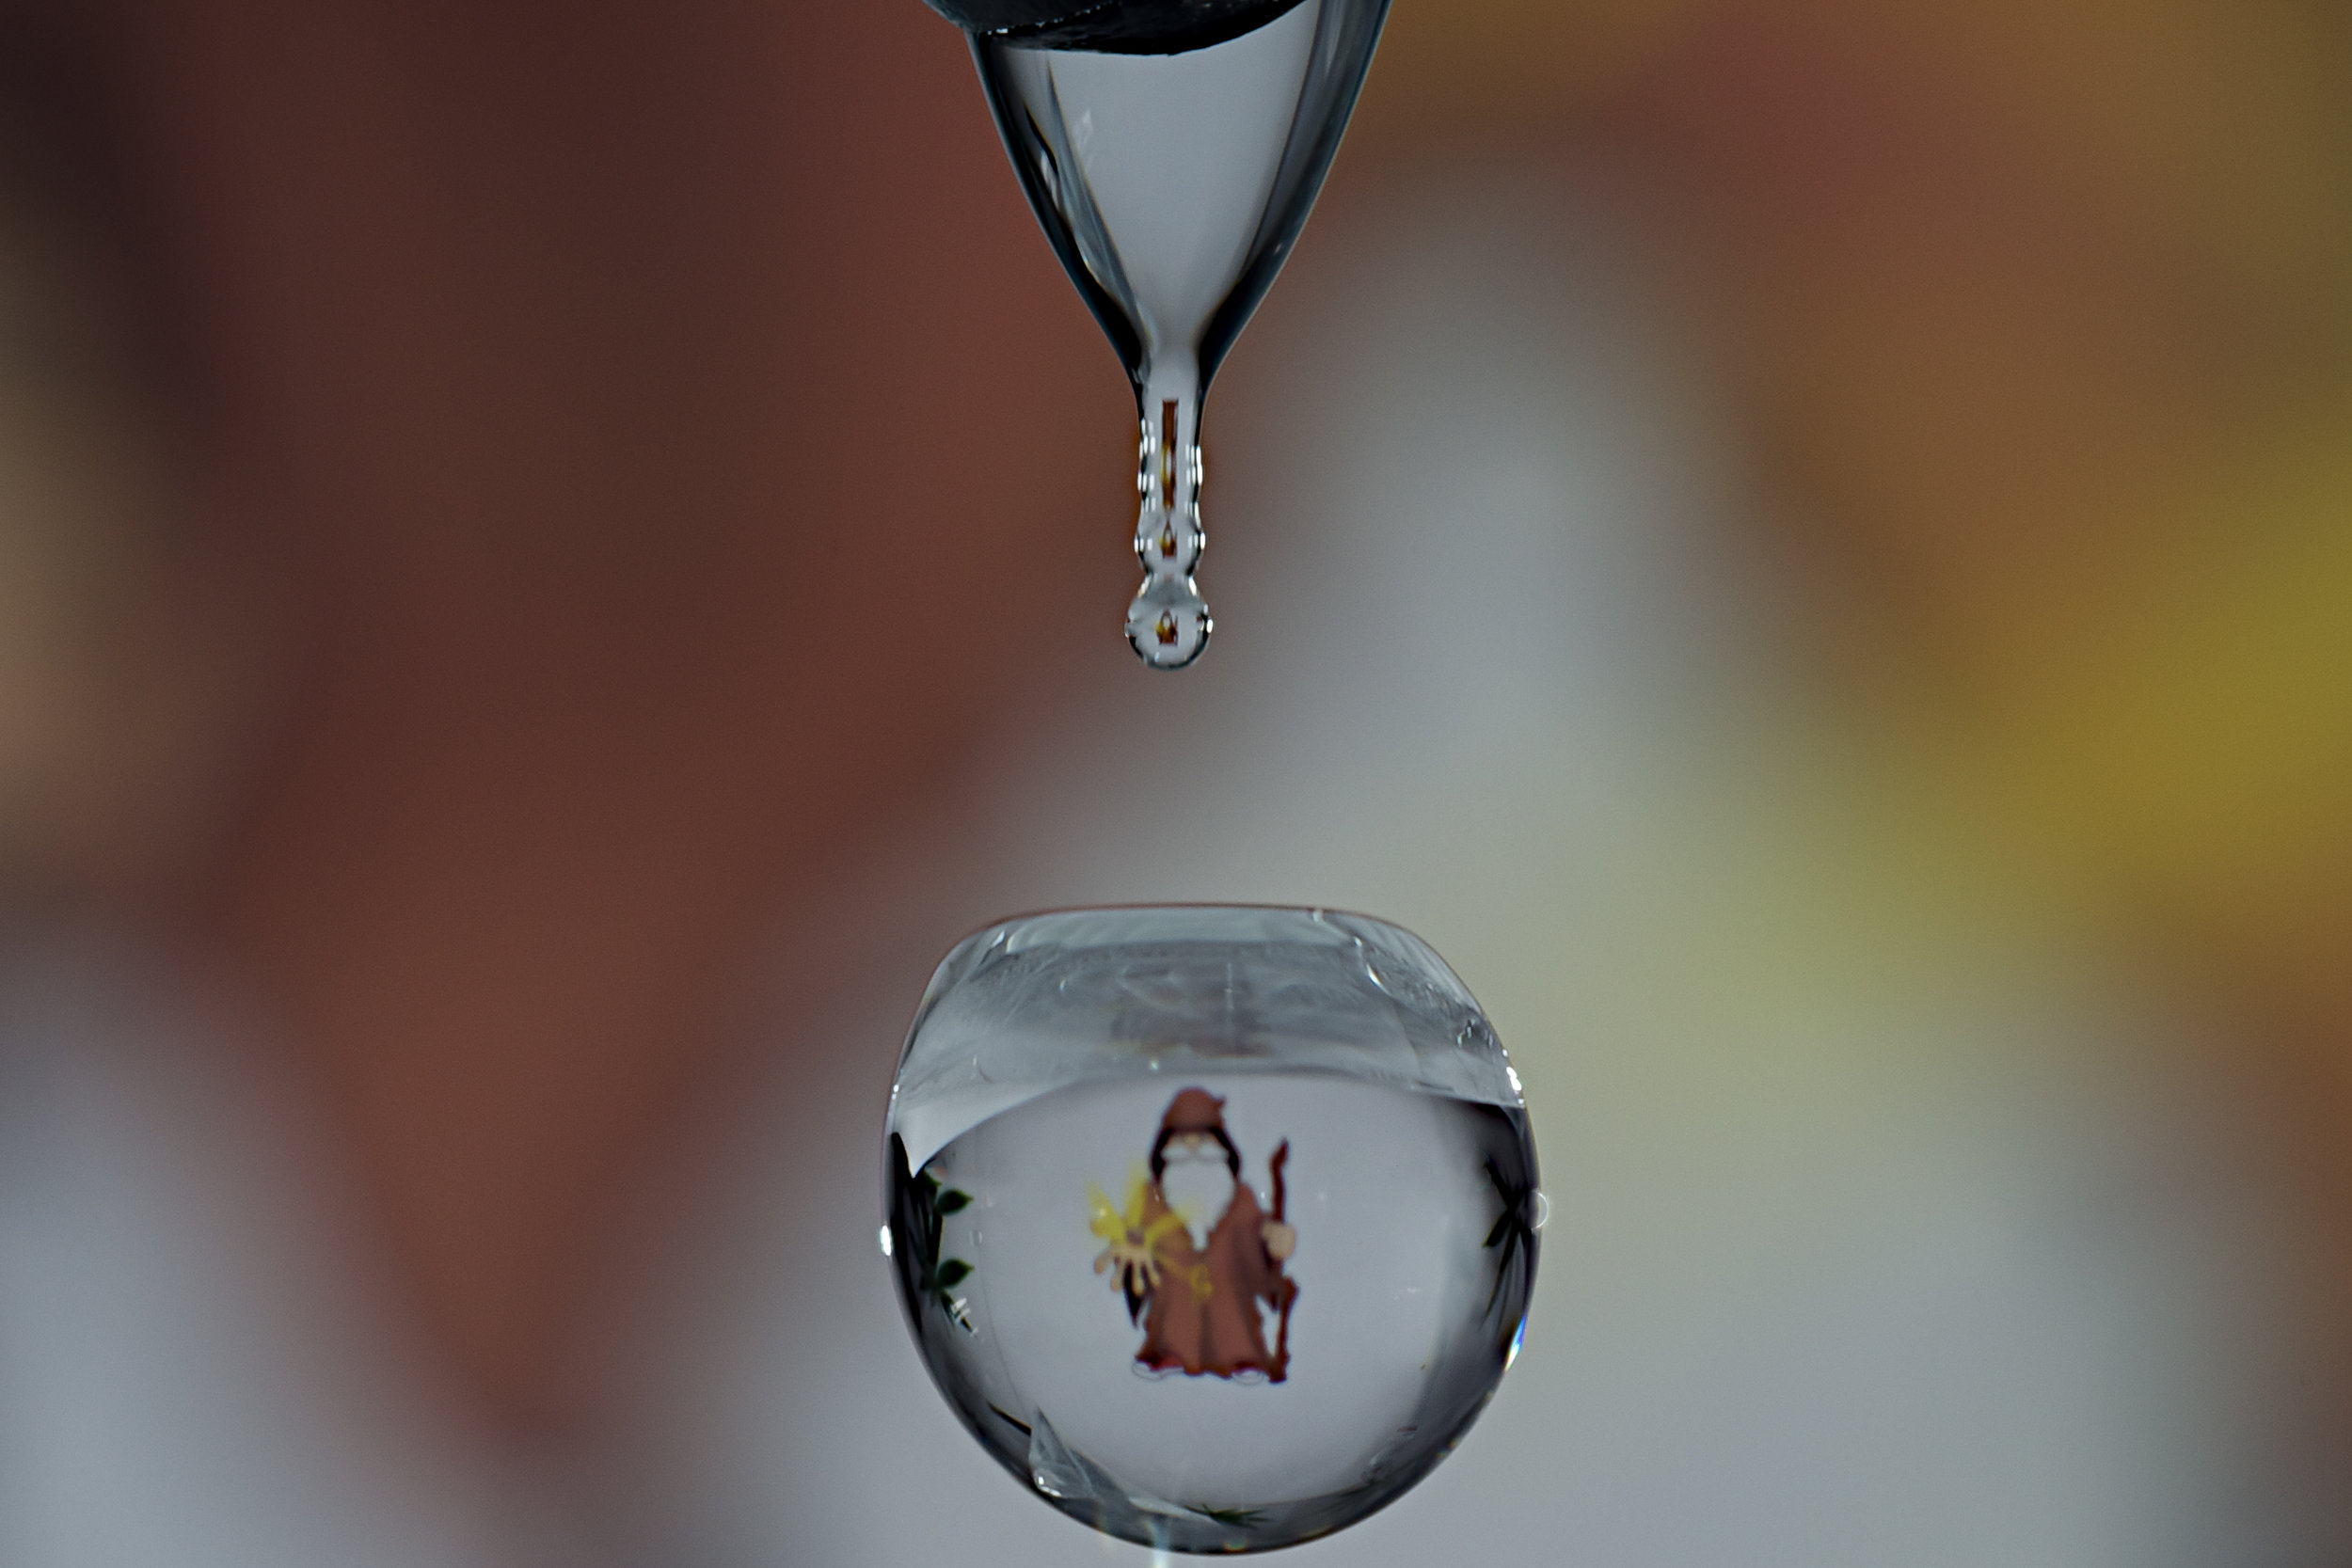 waterdrop reflection